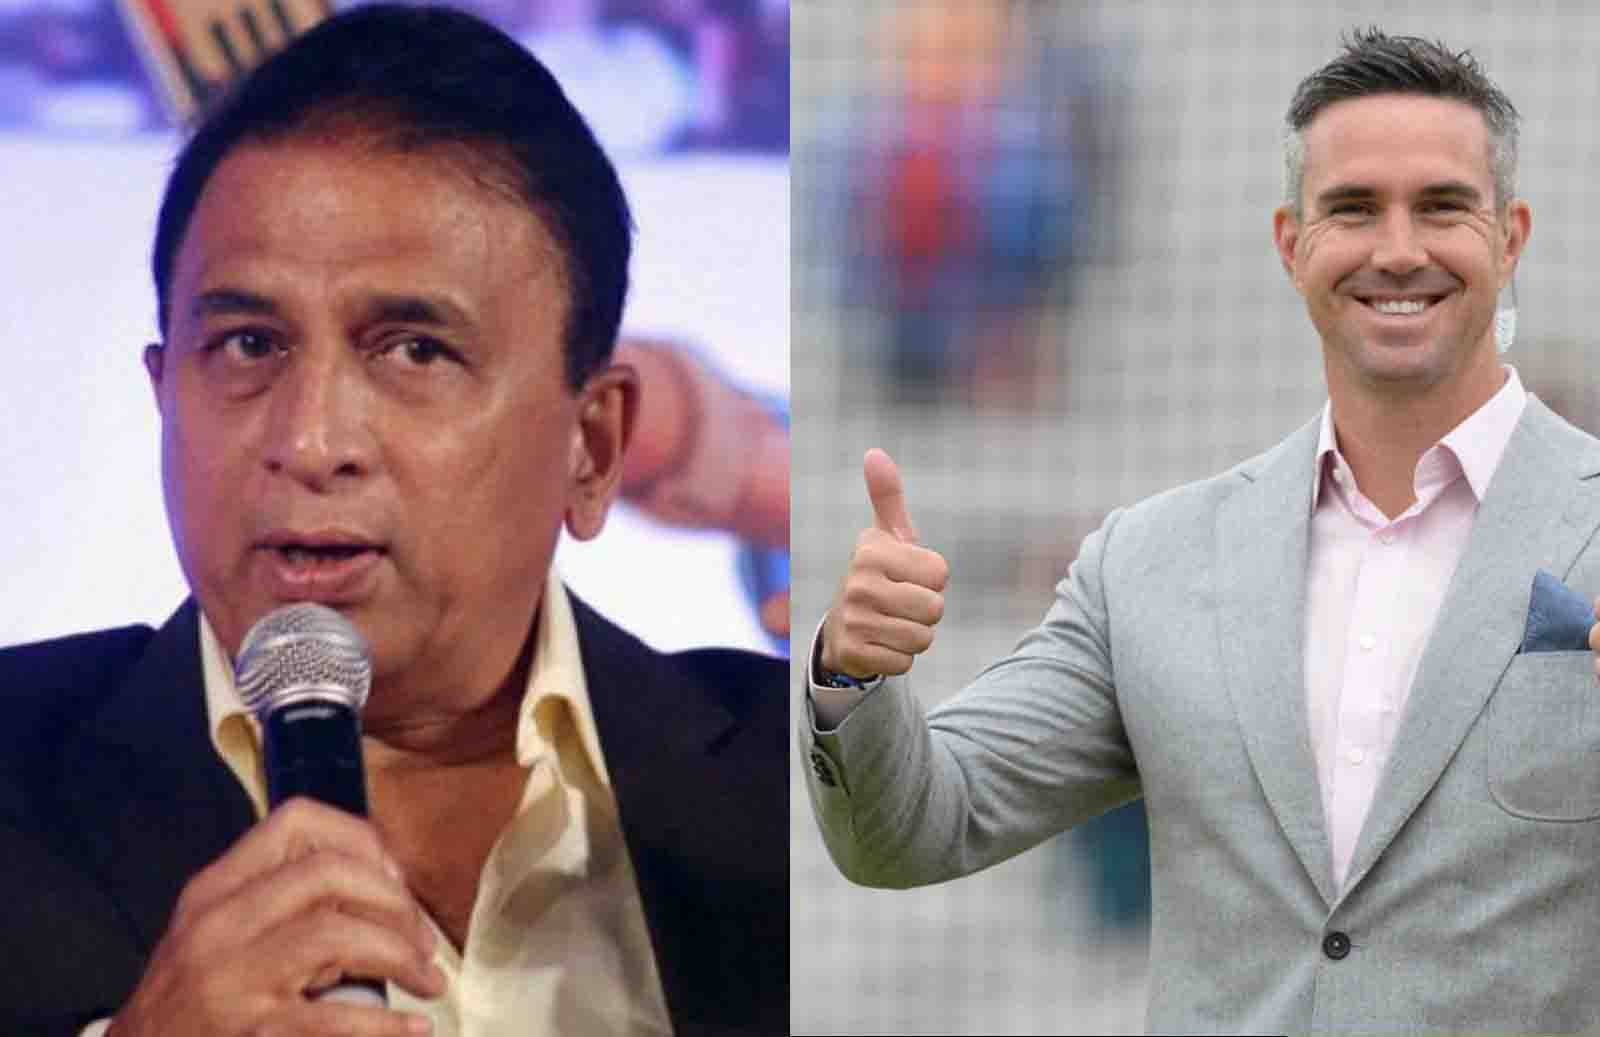 Kevin Pietersen and Sunil Gavaskar criticizes MI for not sending Ishan Kishan to bat in Super Over